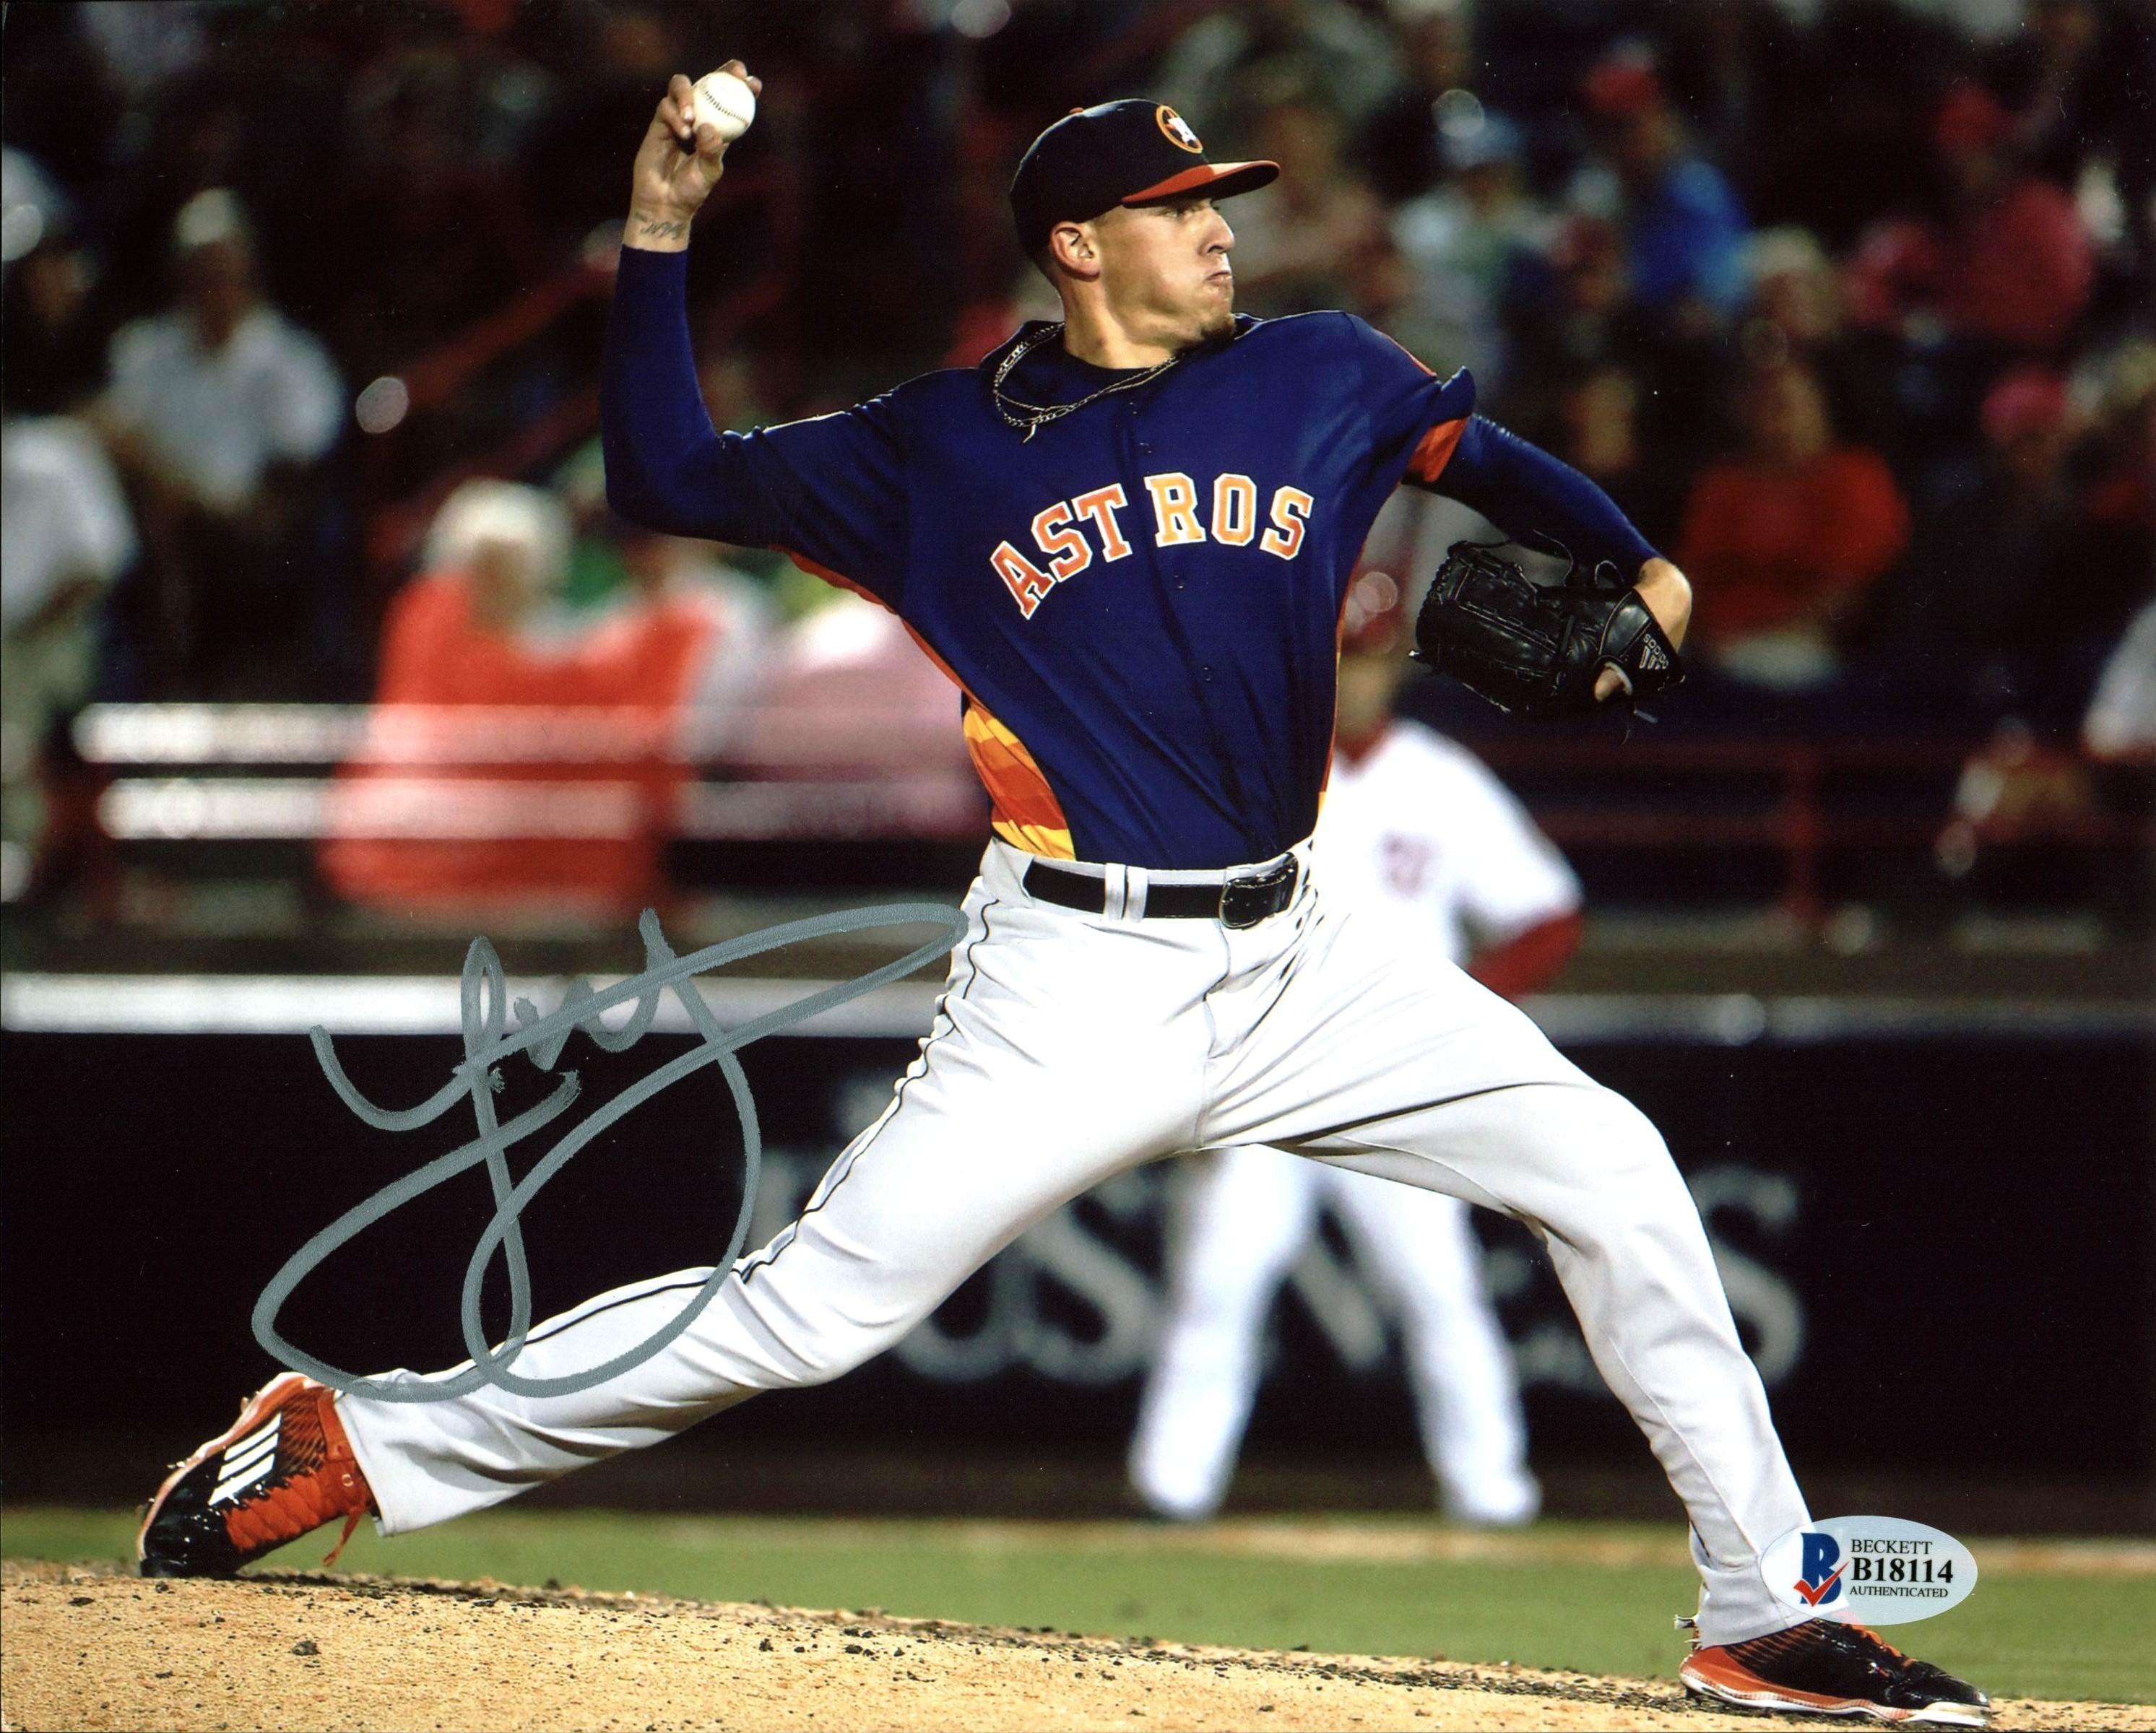 Jose Altuve Houston Astros Autographed 8x10 Photo VIP-B04488